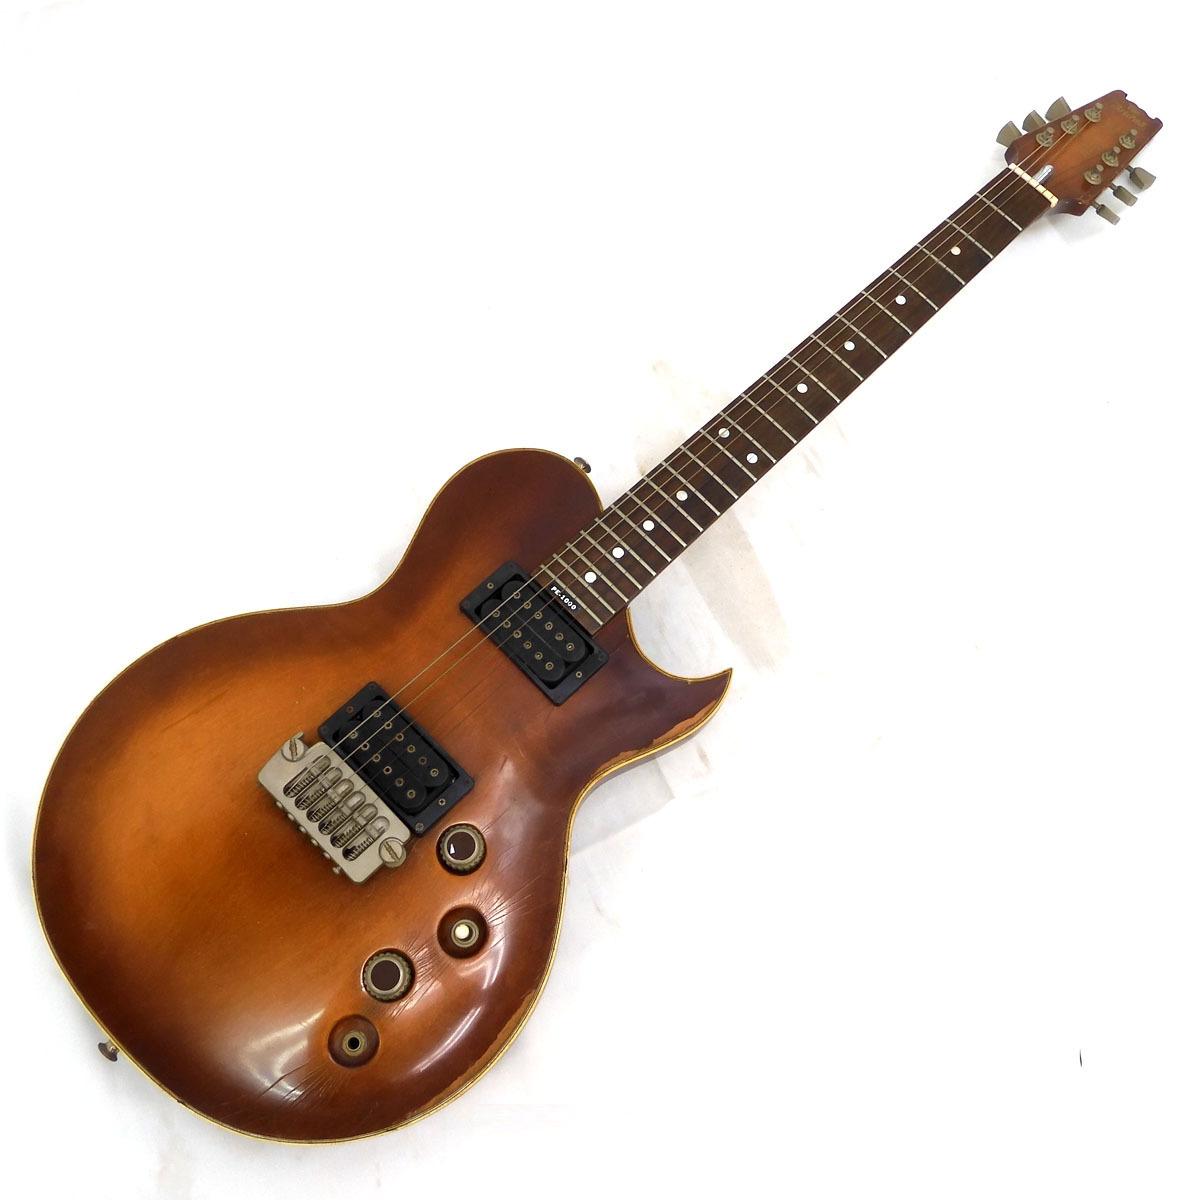 ACB-C3B361 The AriaProⅡ アリアプロツー PE-1000 エレキギター 70年代 ビンテージ 098010 ジャパン 弦楽器 現状お渡し 中古品